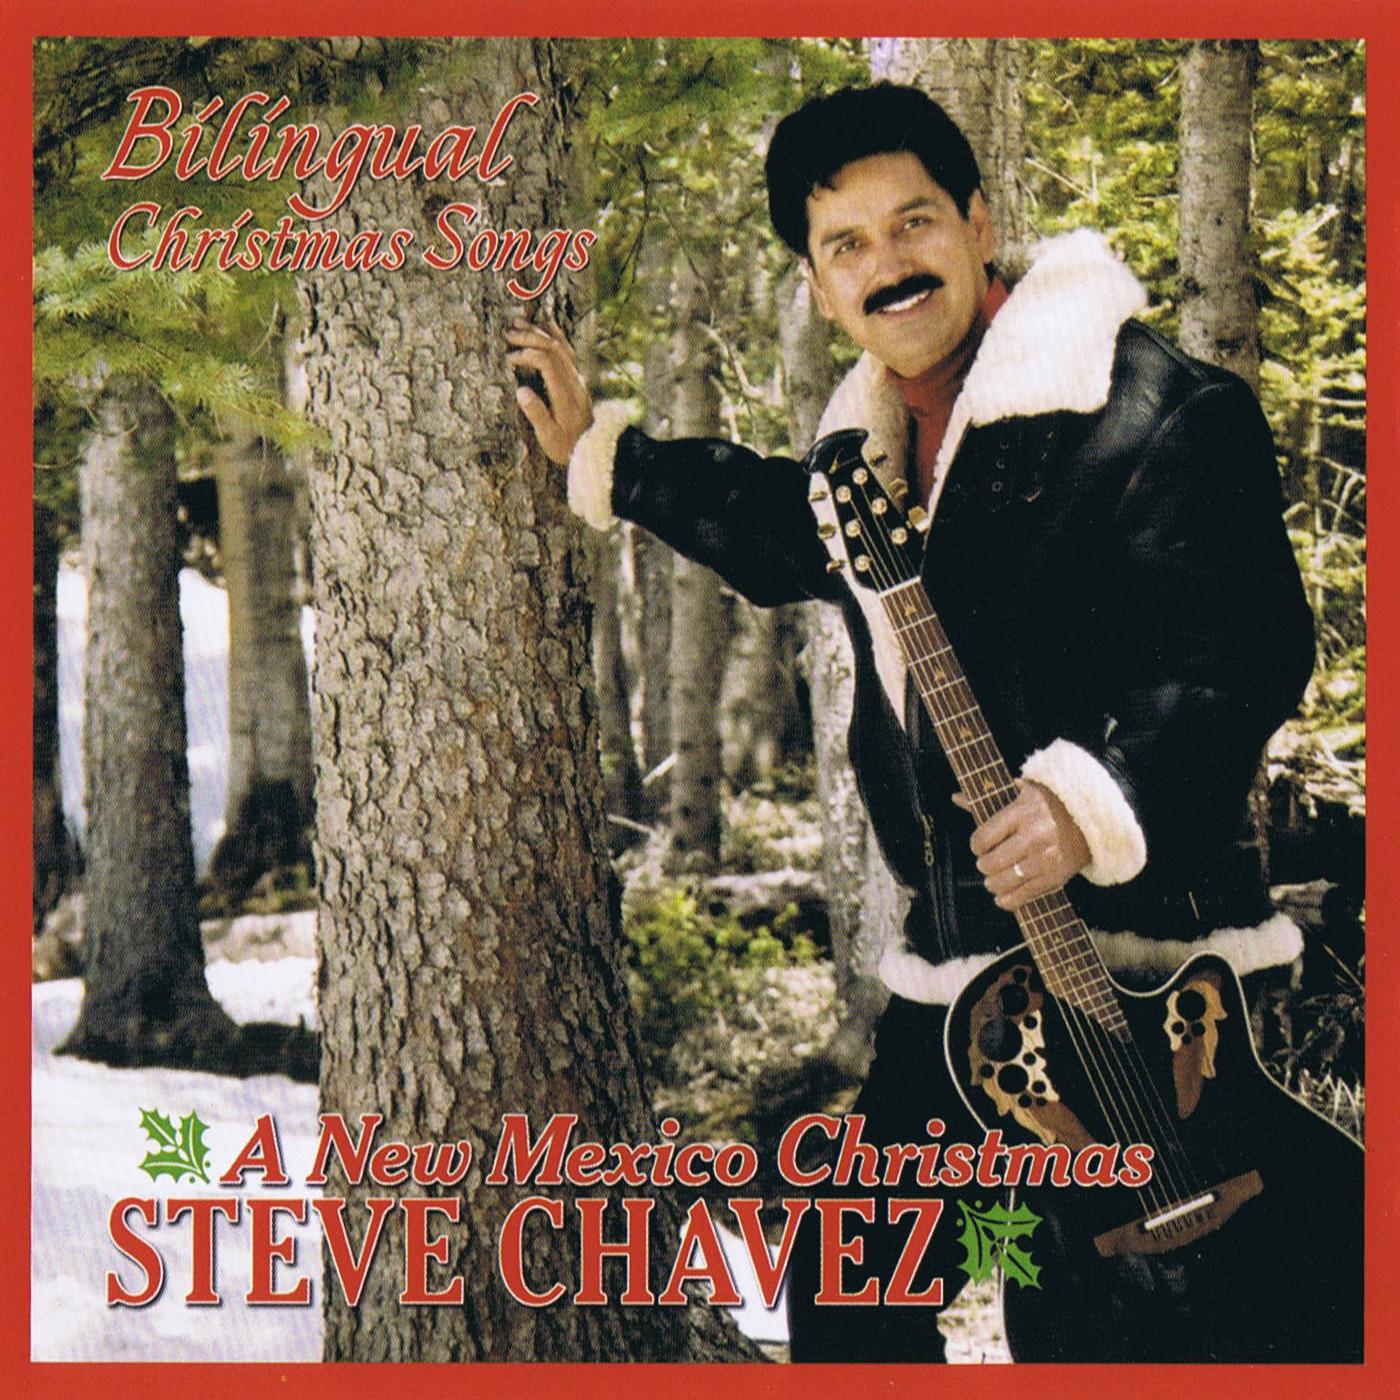 steve chavez a new mexico christmas cd